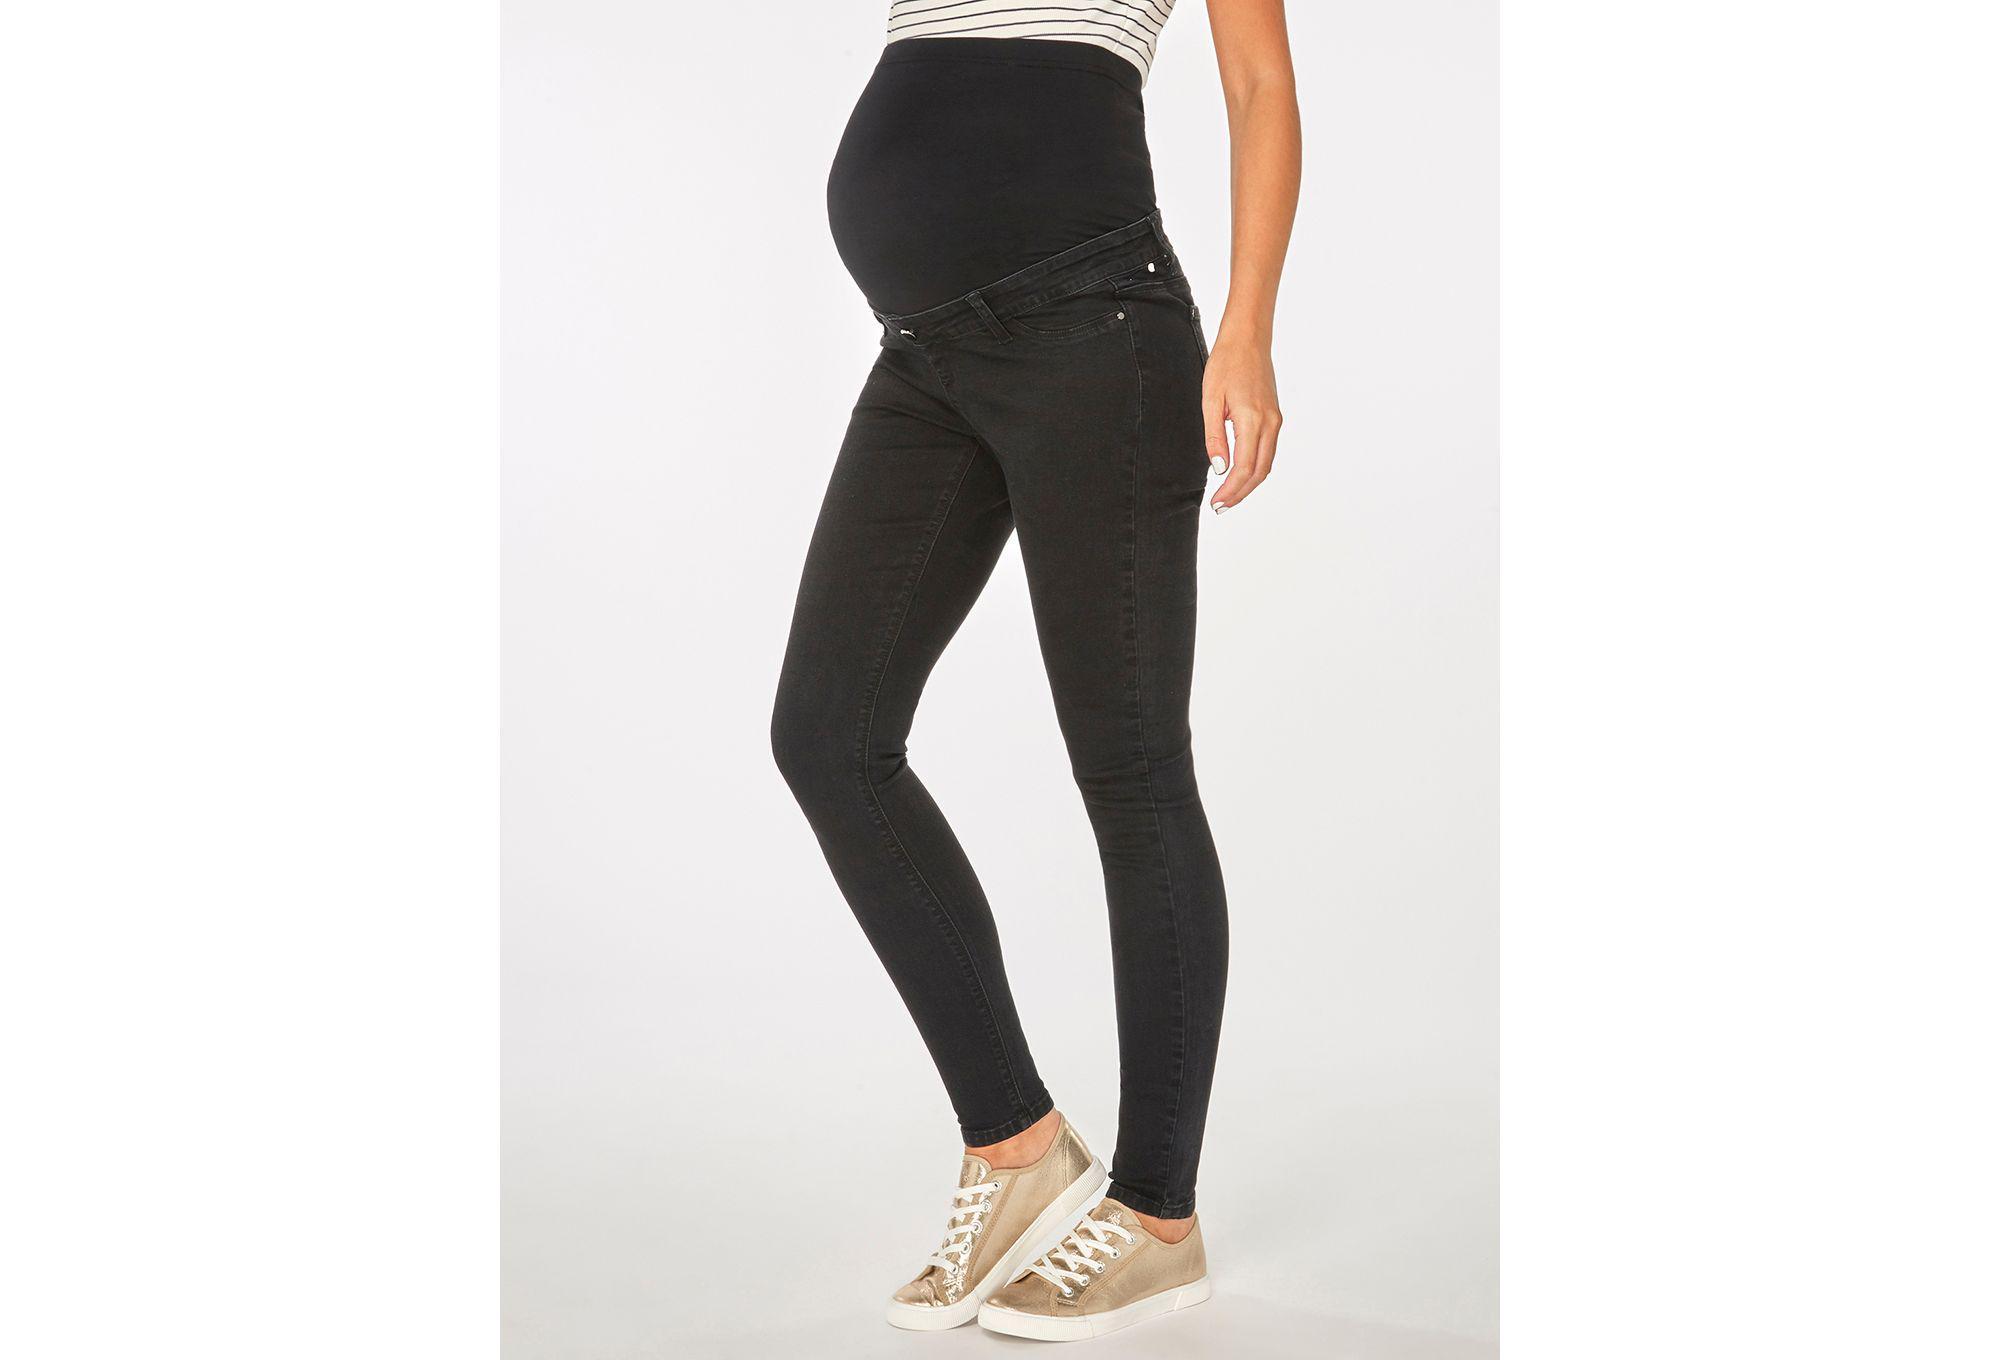 a4c4d2cf9af83 Dorothy Perkins Maternity Black Darcy Ankle Grazer Jeans in Black - Lyst